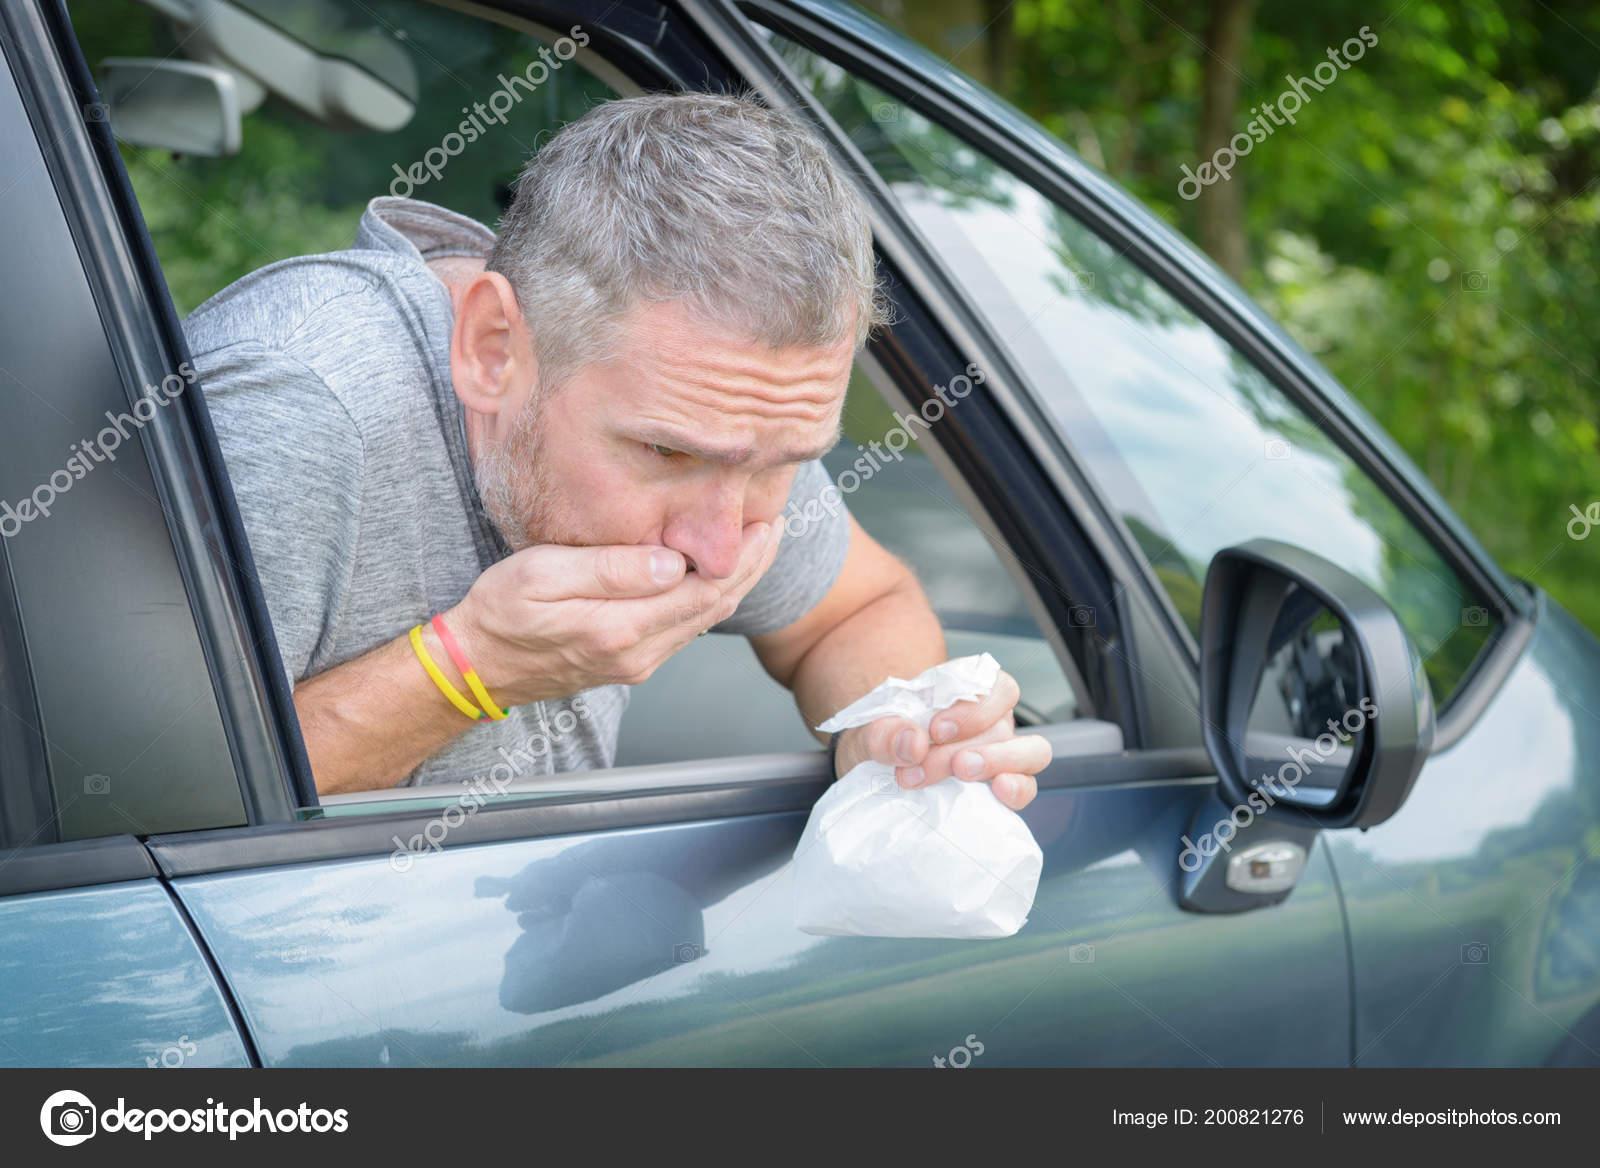 Man Suffering Motion Sickness Car Holding Sick Bag